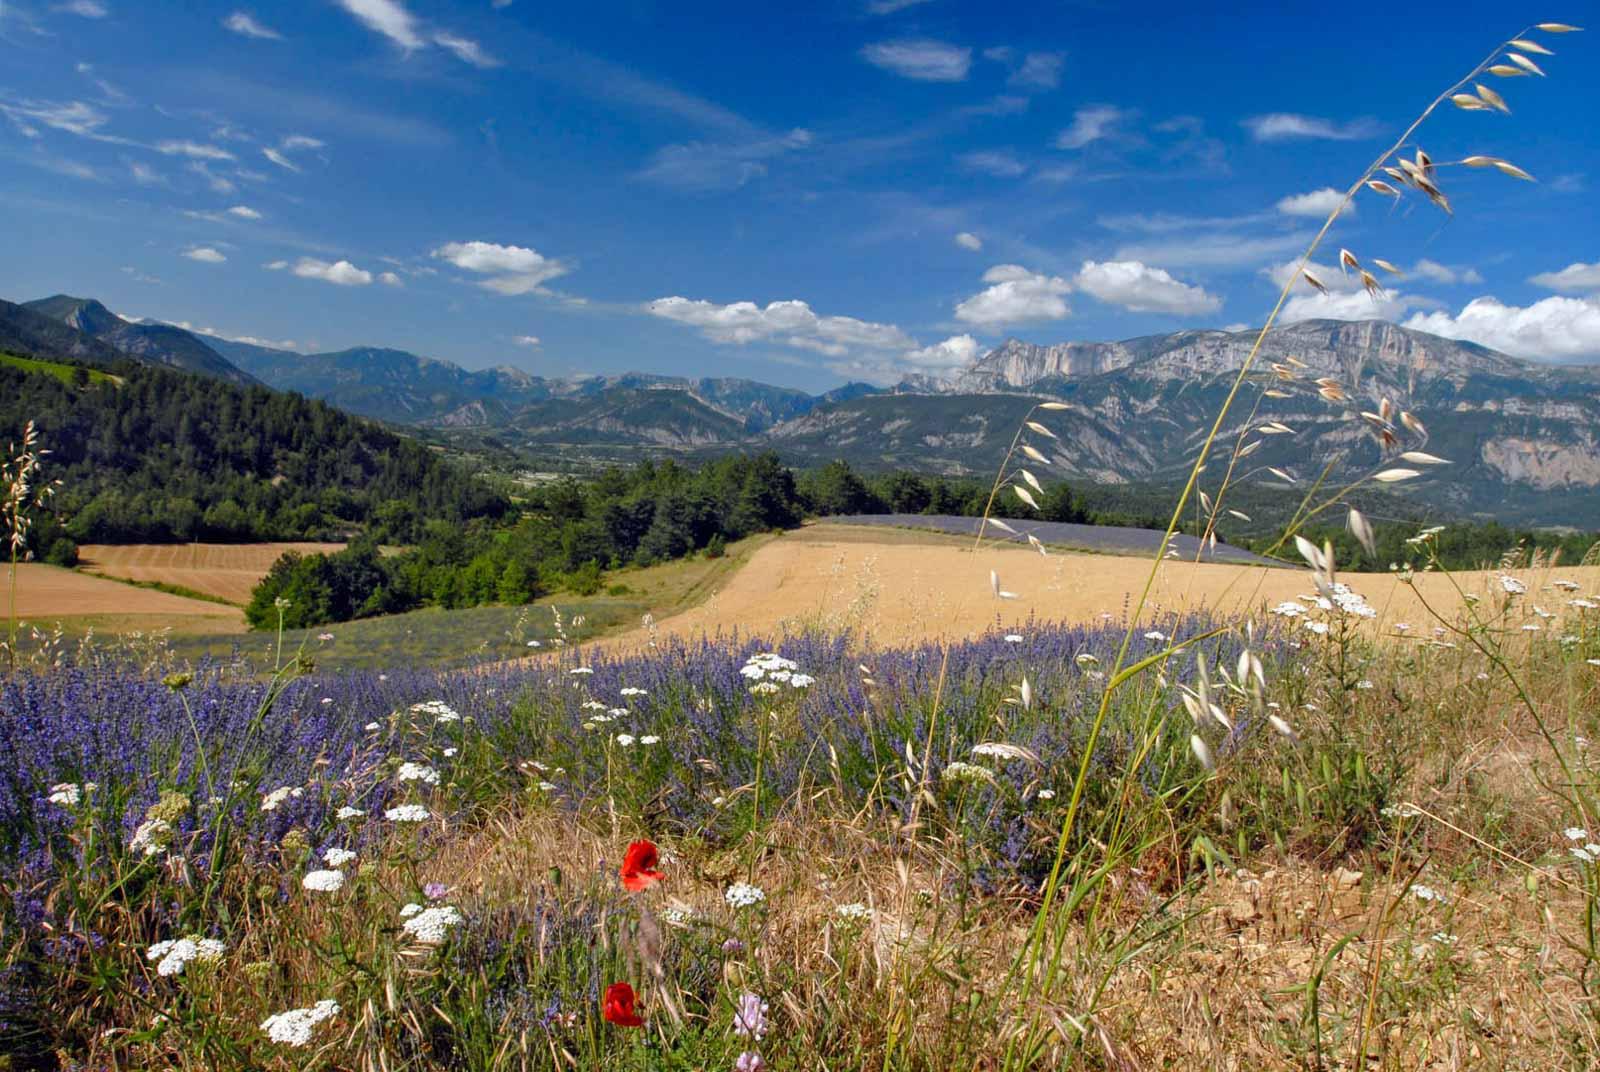 drome paysage - Image